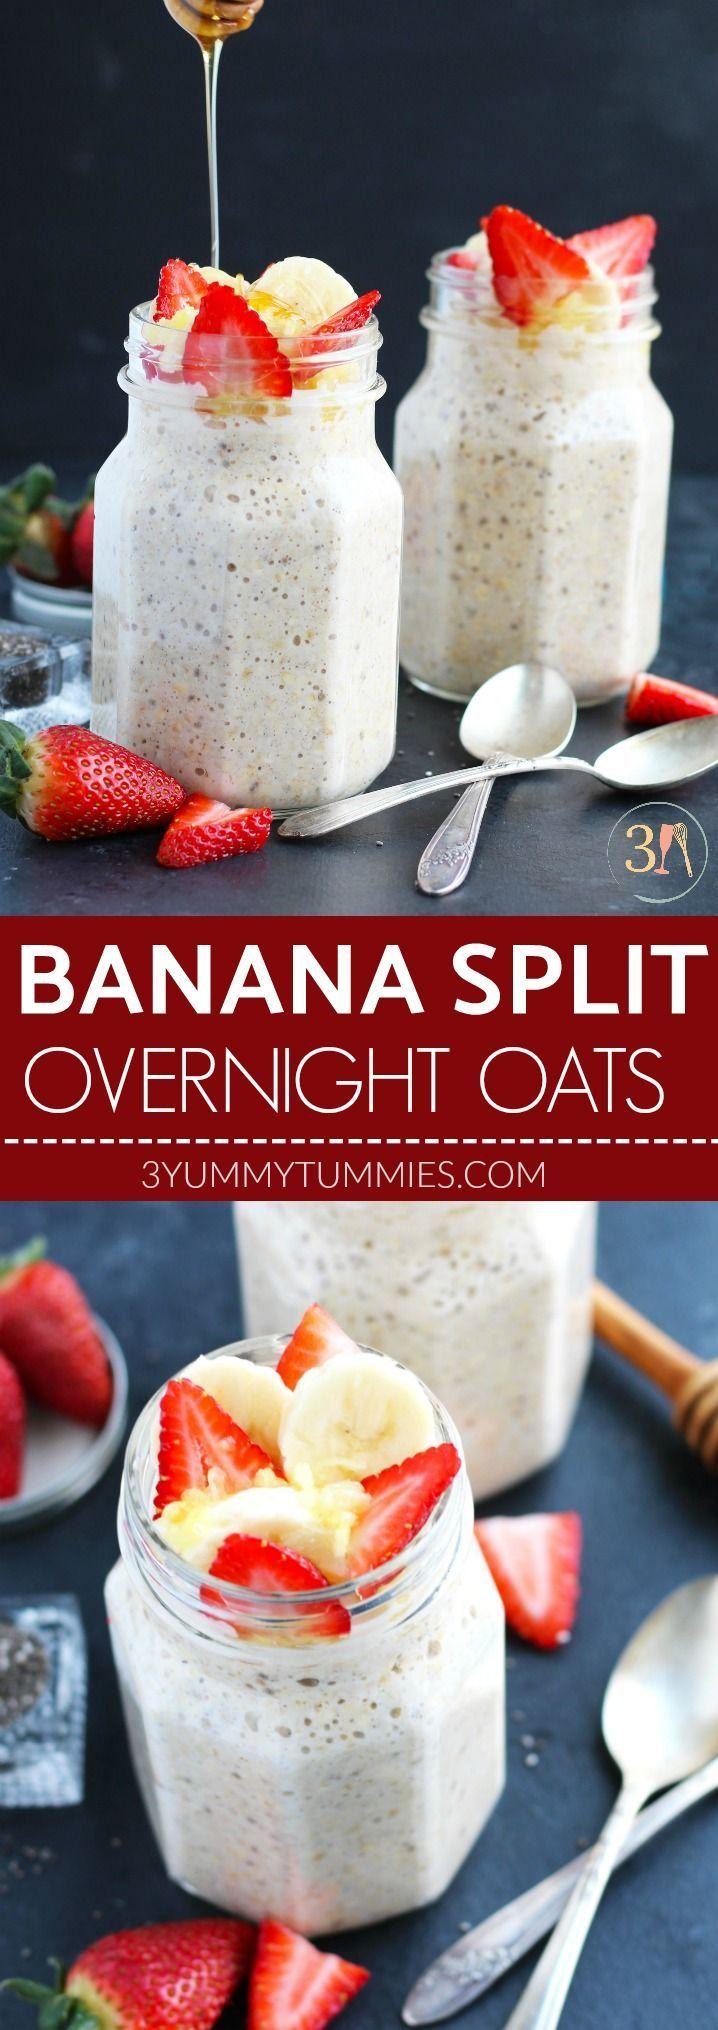 Banana Split Overnight Oats Banana Split Overnight Oats 3 Yummy Tummies 3yummytummies Recipes by 3 Yummy Tummies These Banana Split Overnight Oats are a nbsp hellip break...